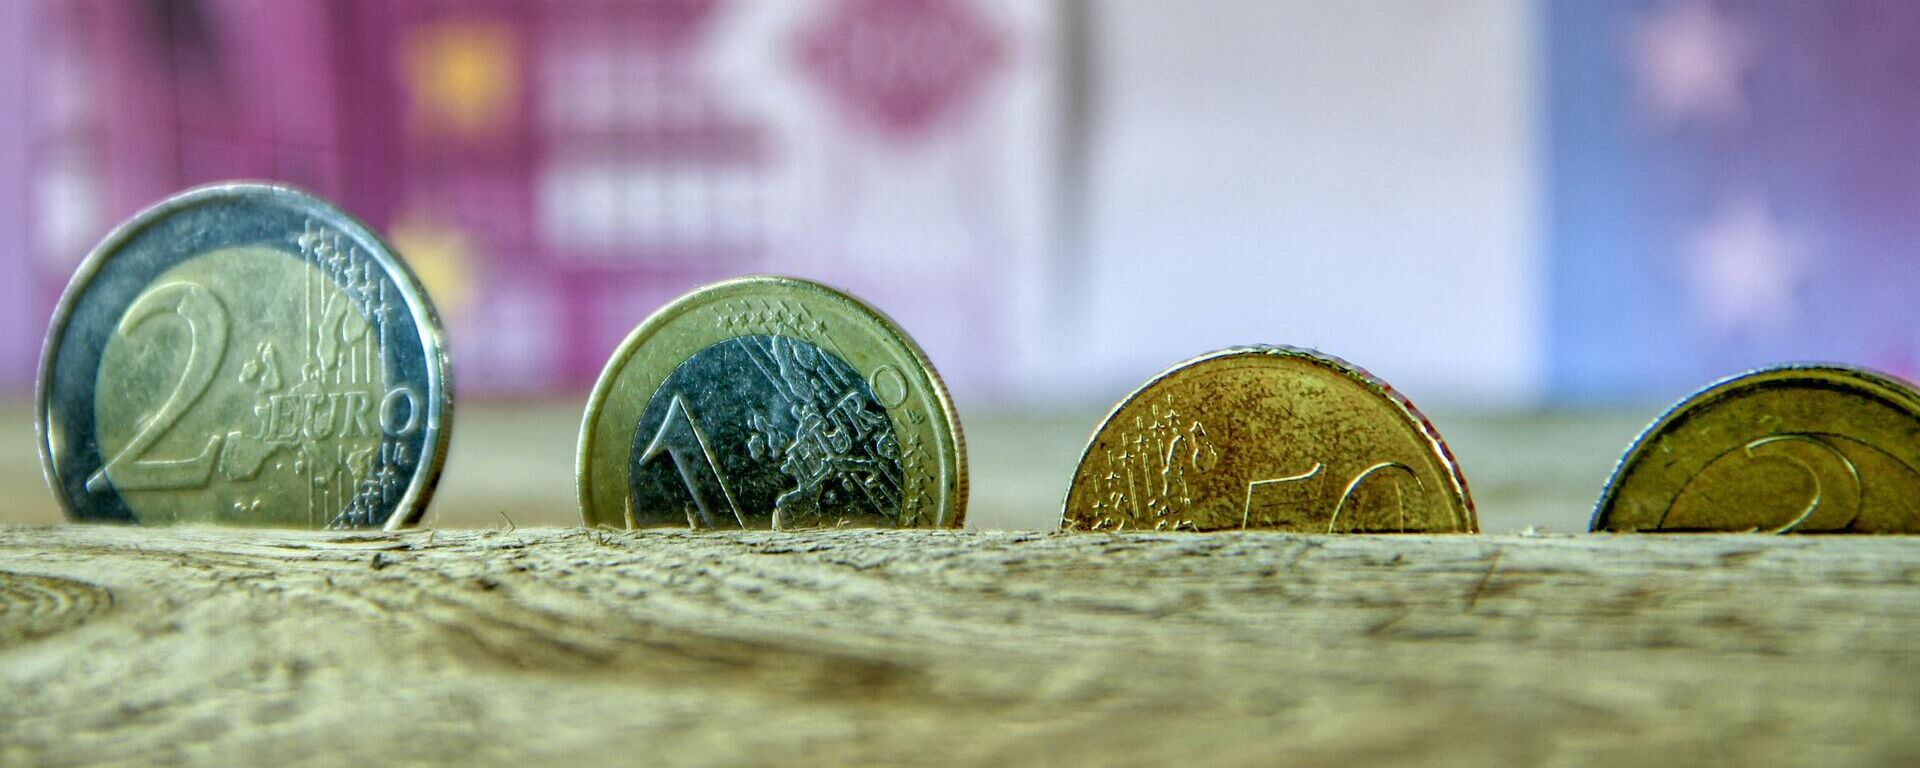 Münzen (Symbolbild) - SNA, 1920, 02.10.2021